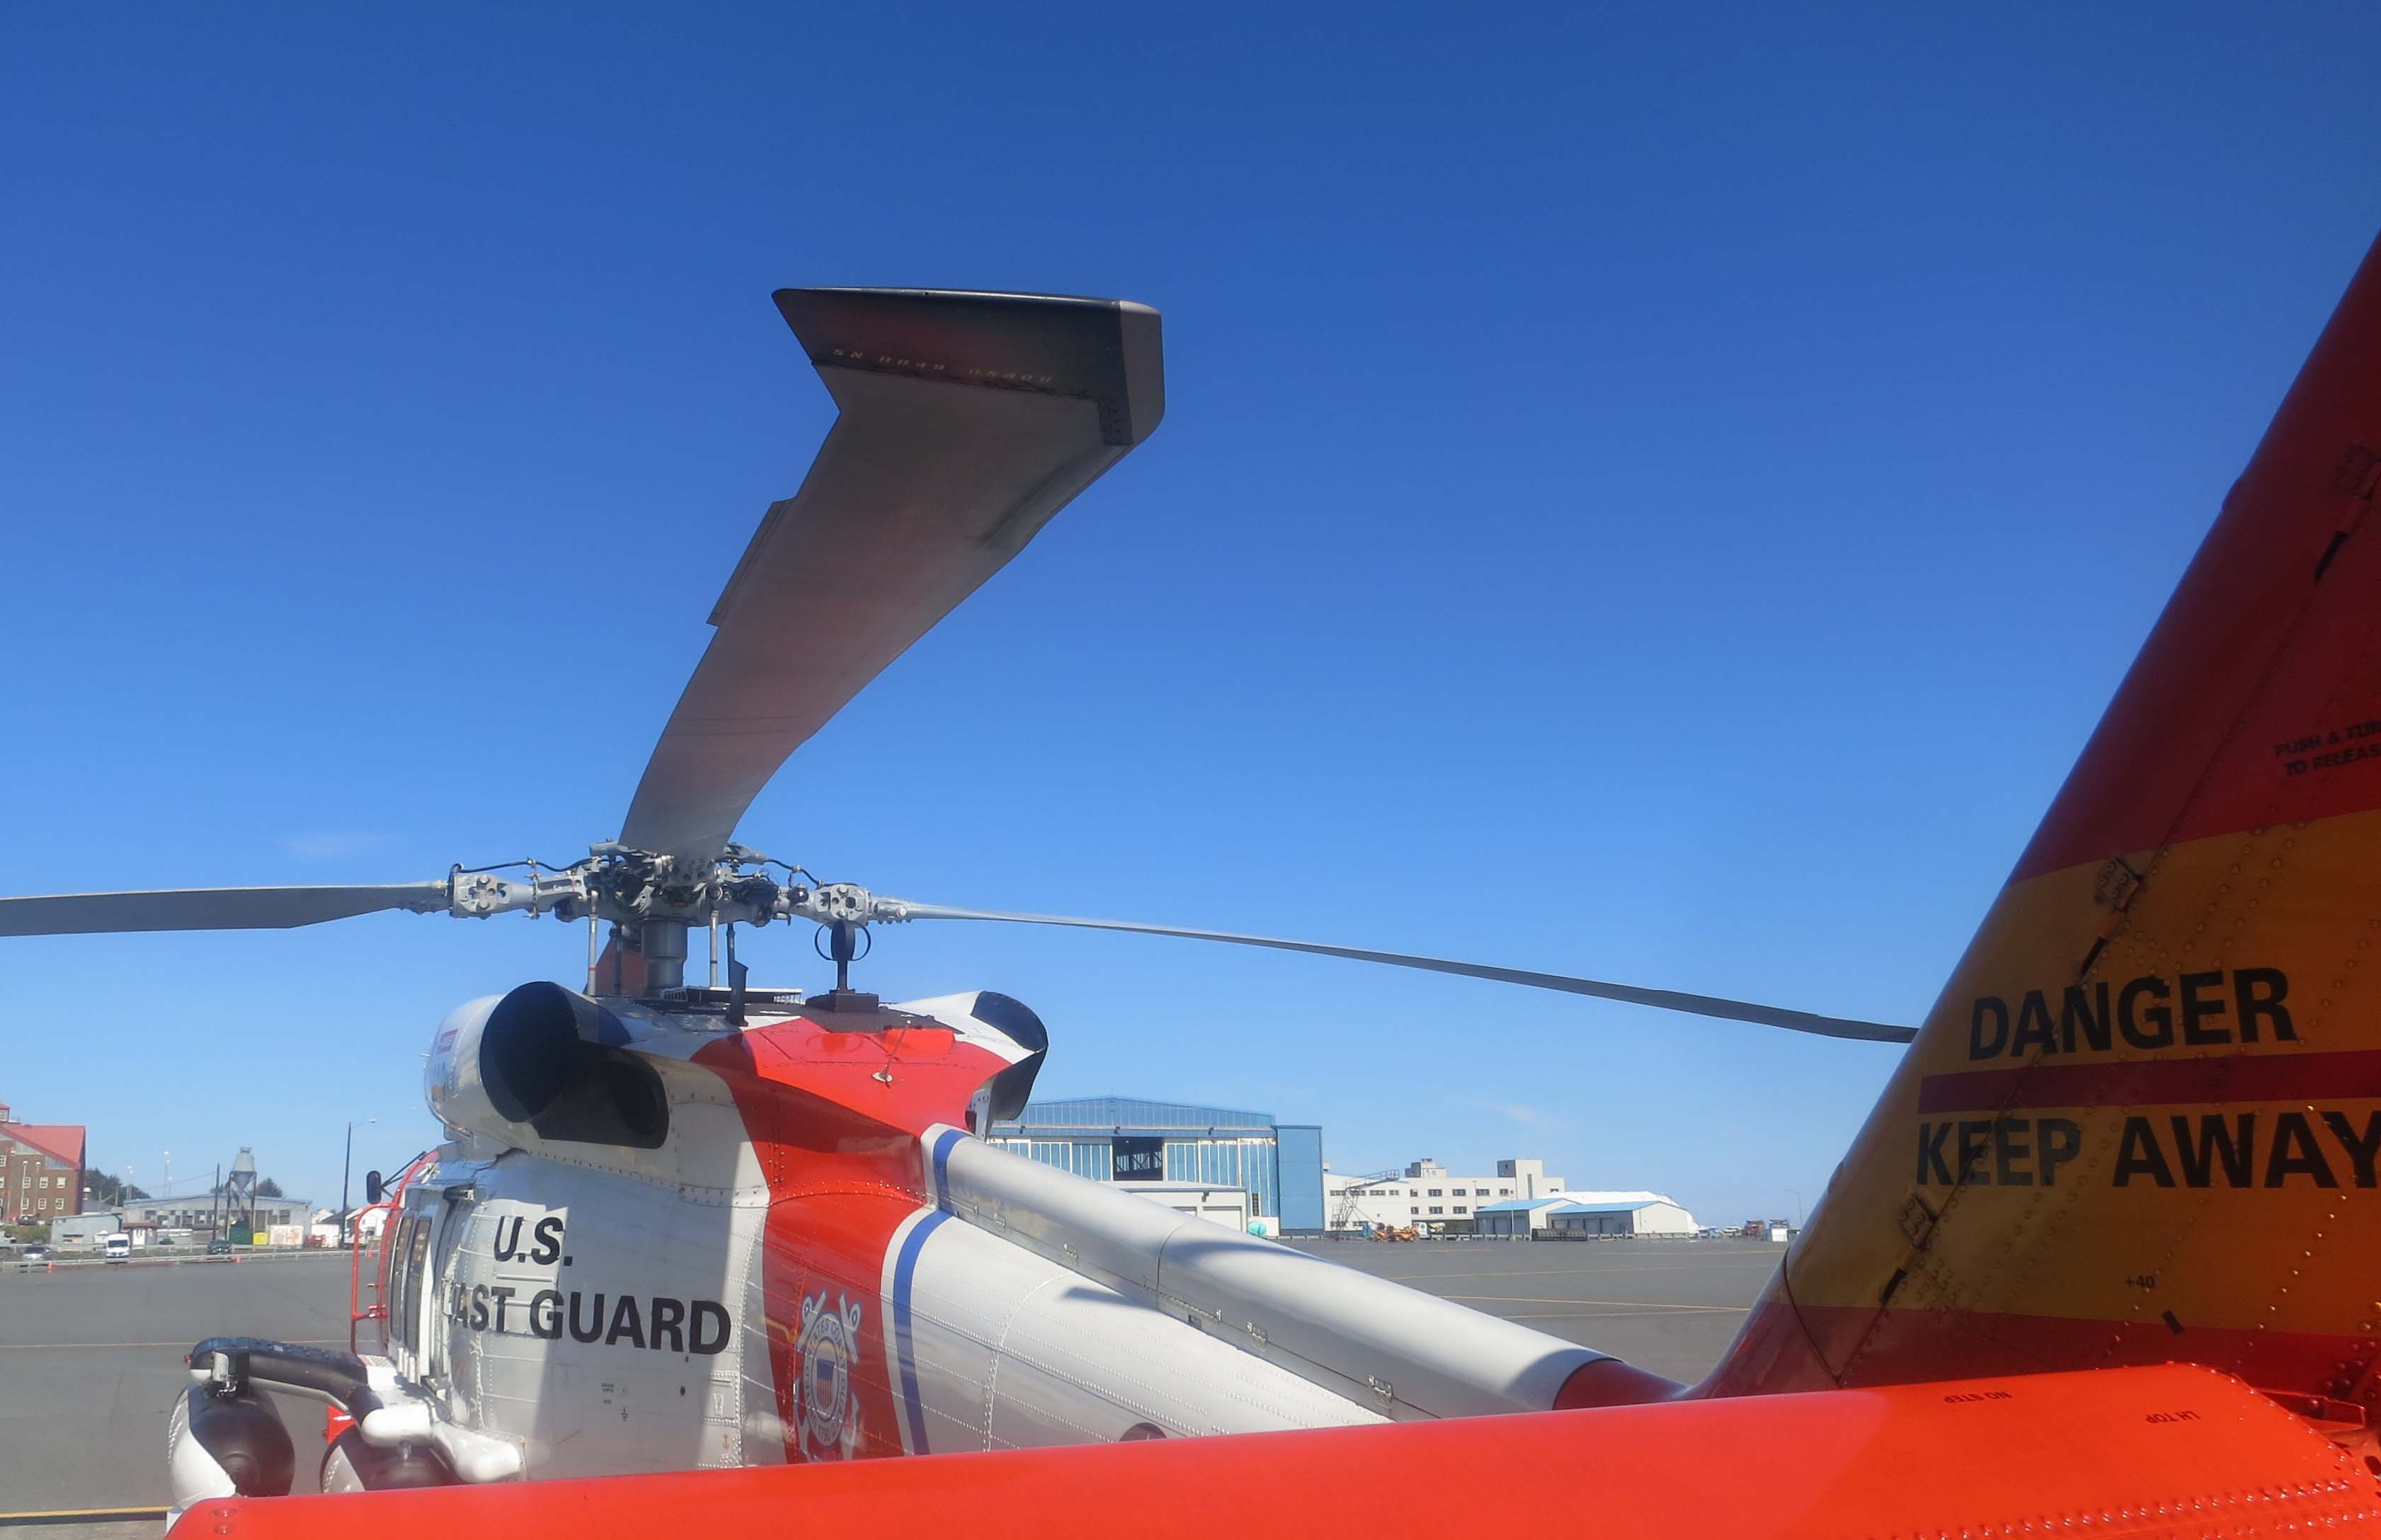 H-60 ready to fly at Coast Guard Station in Kodiak, Alaska.